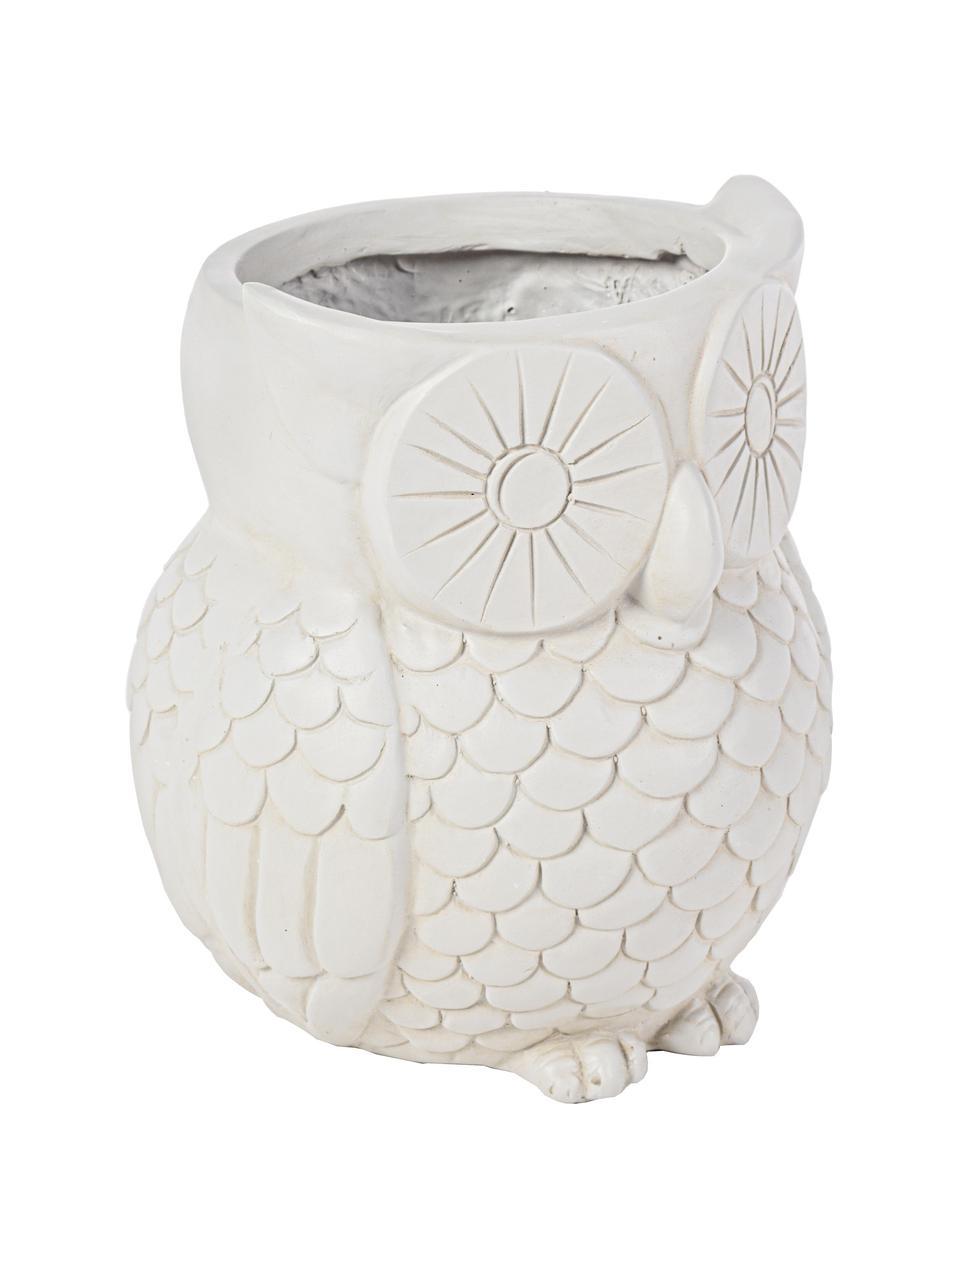 Großer Pflanztopf Owl, Kunststoff, Gebrochenes Weiß, Ø 35 x H 31 cm